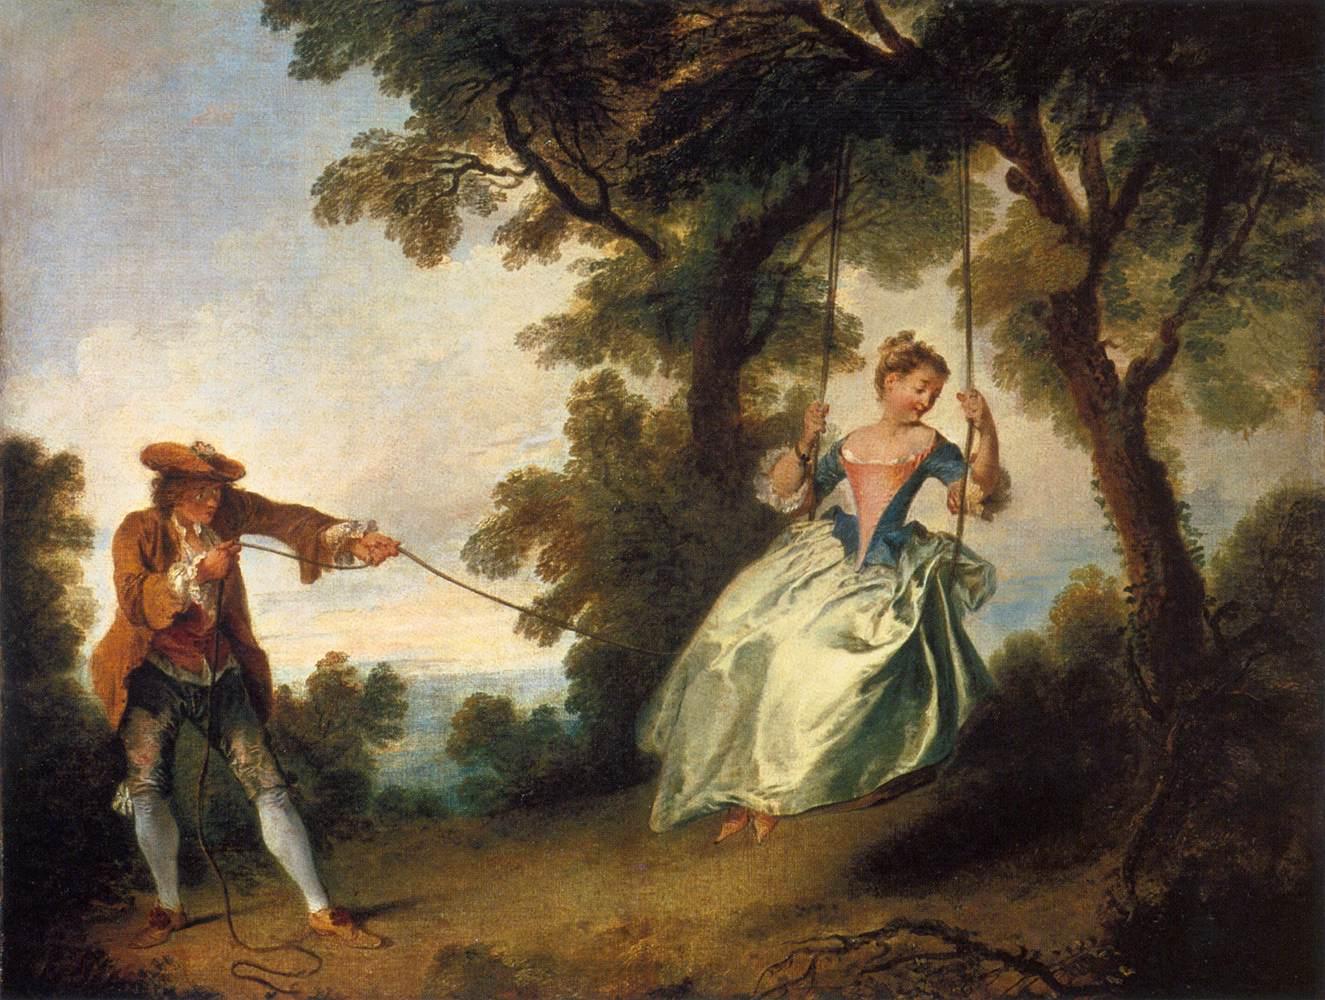 'The Swing' by Nicolas Lancret 1735